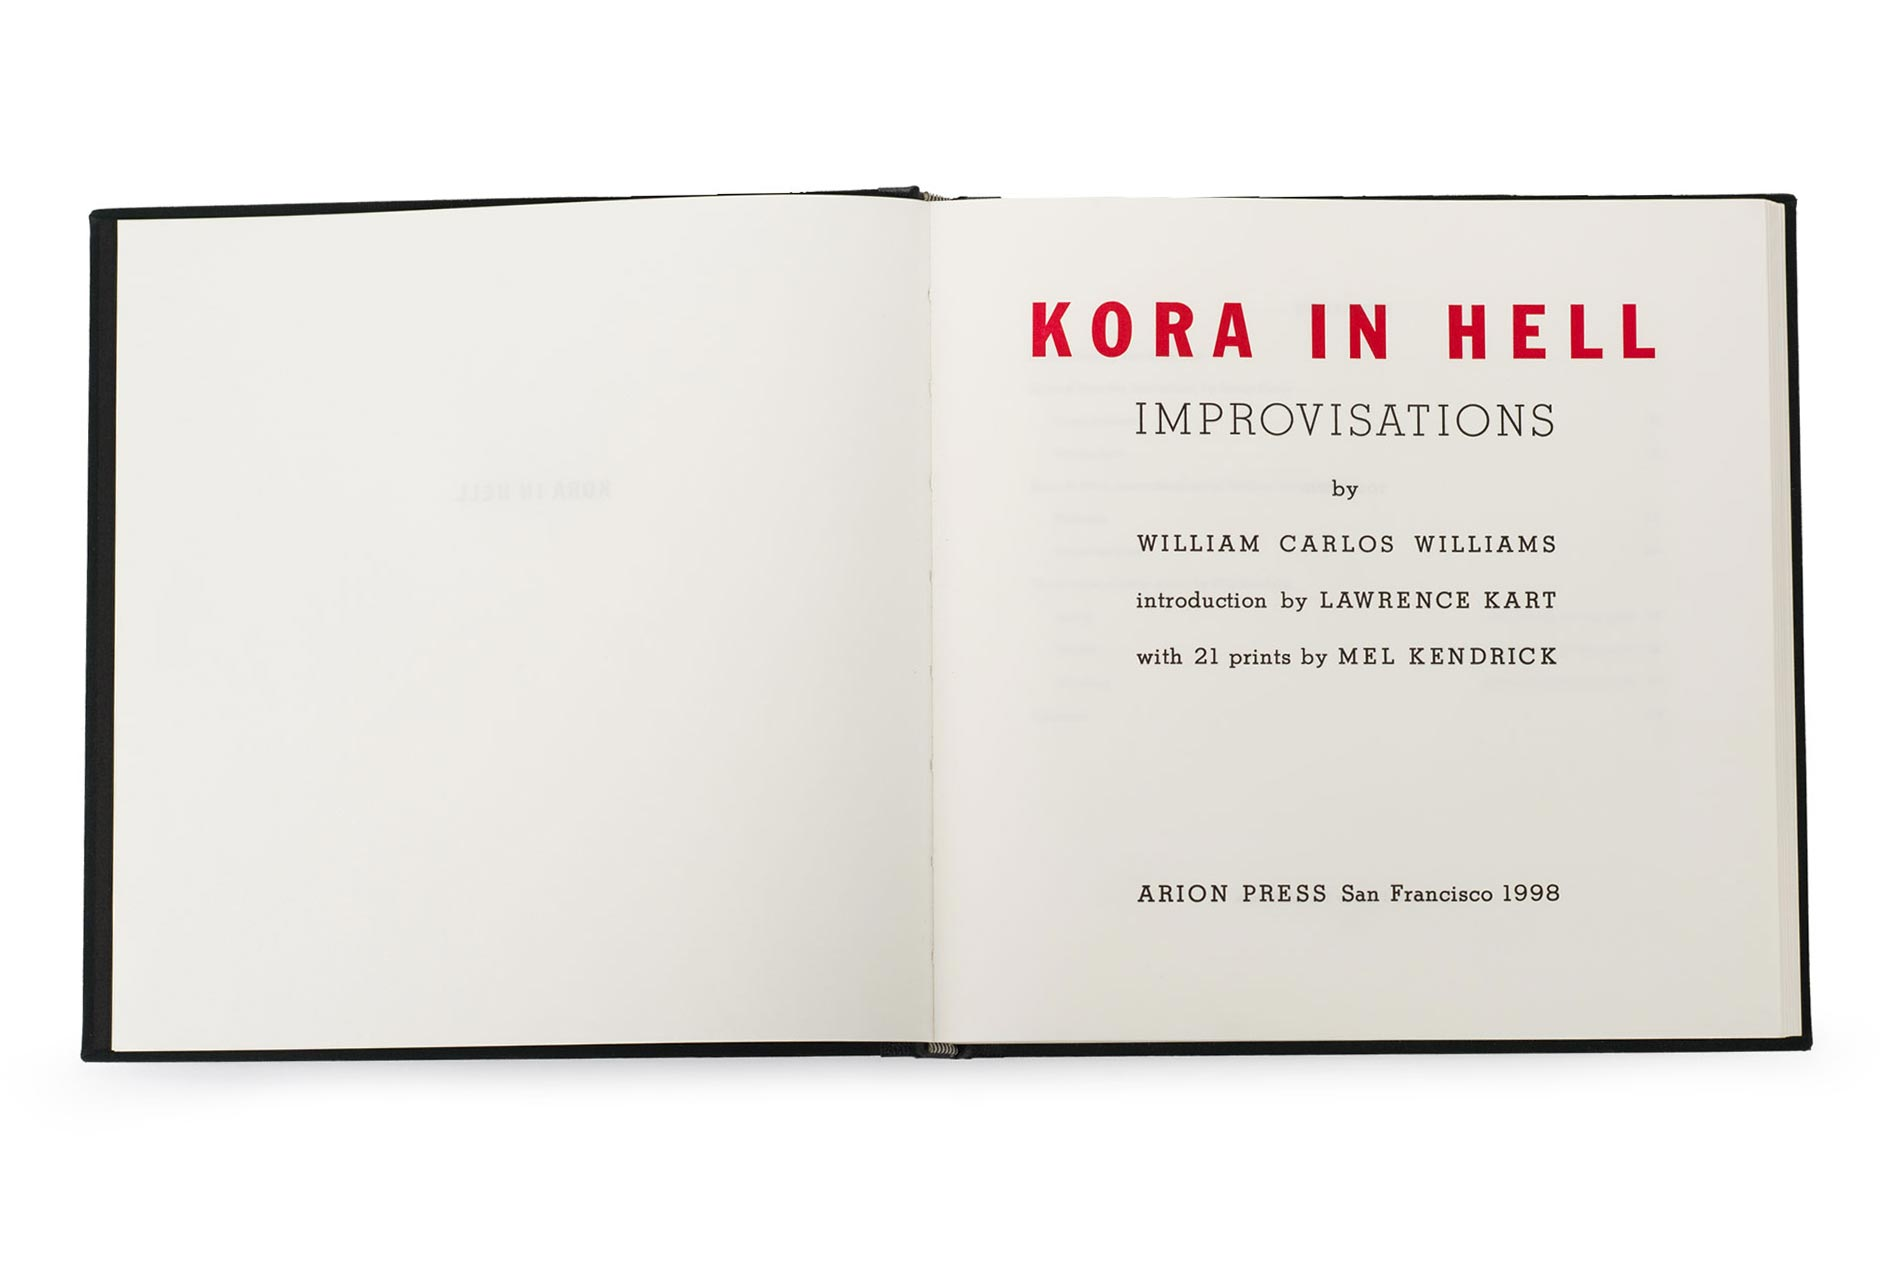 056_Kora-in-Hell-Title-fix.crop.jpg